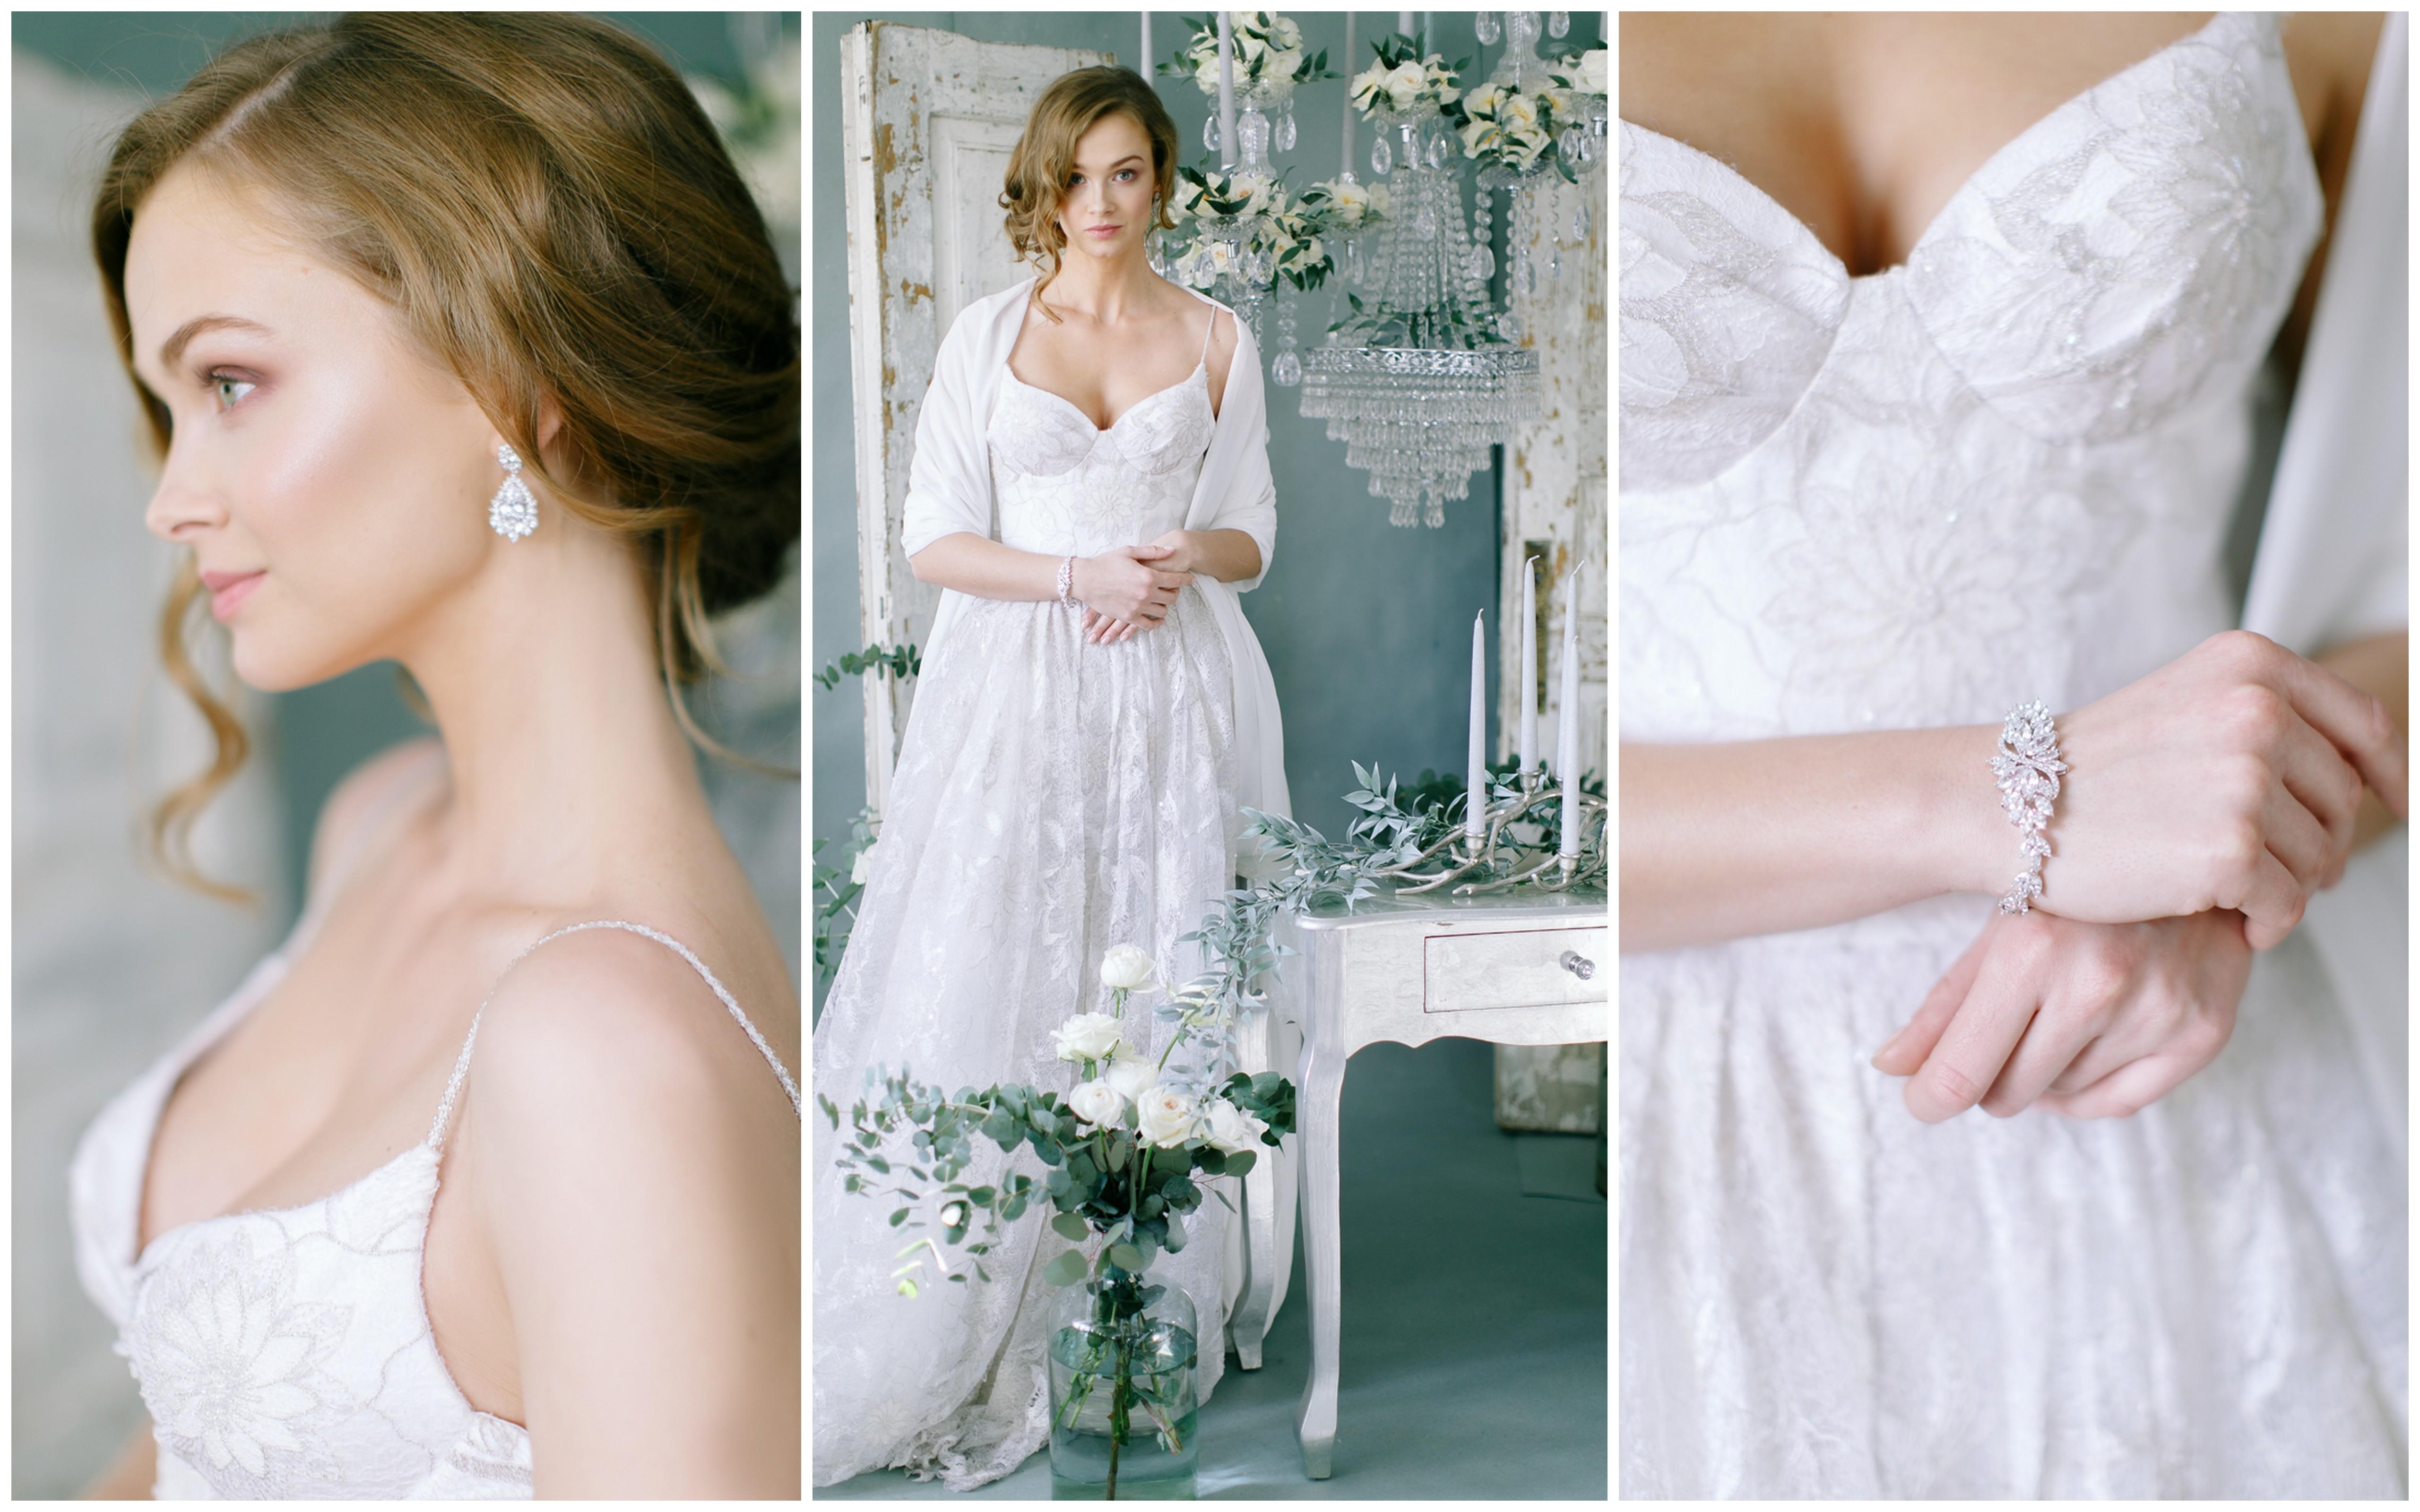 biżuteria na ślub Warszawa